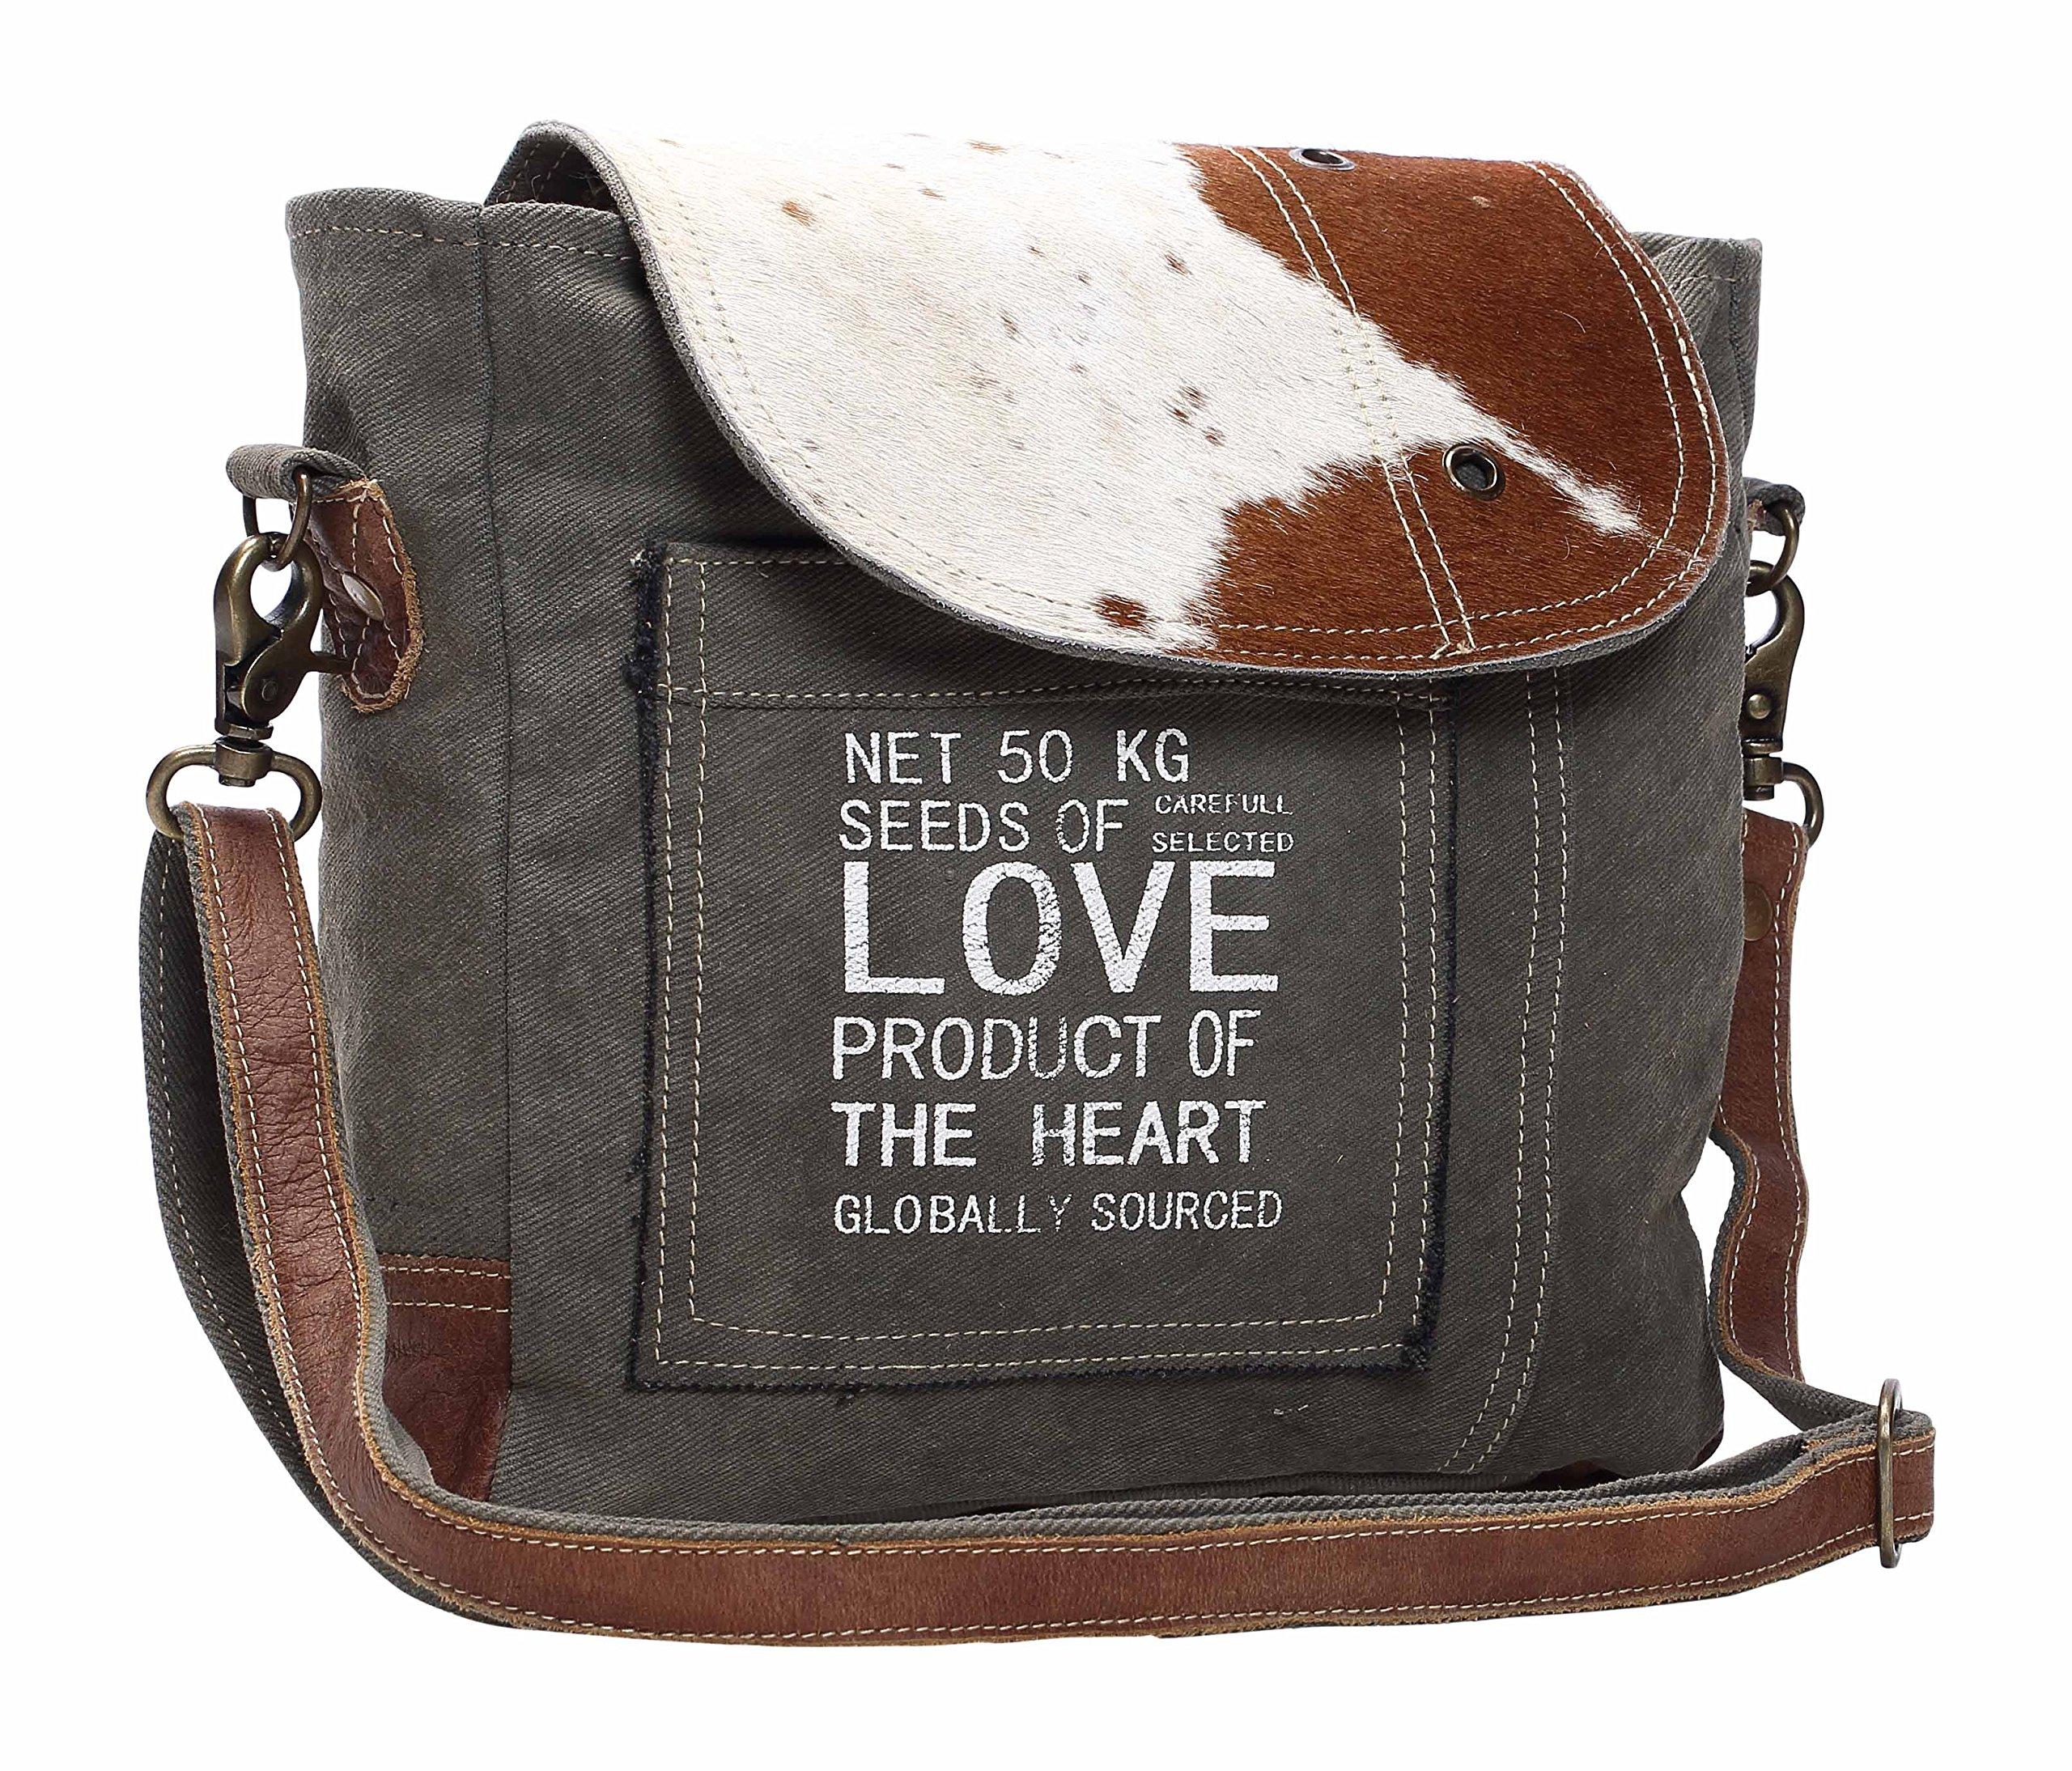 Myra Bag Seeds of Love Upcycled Canvas & Cowhide Shoulder Bag S-1127